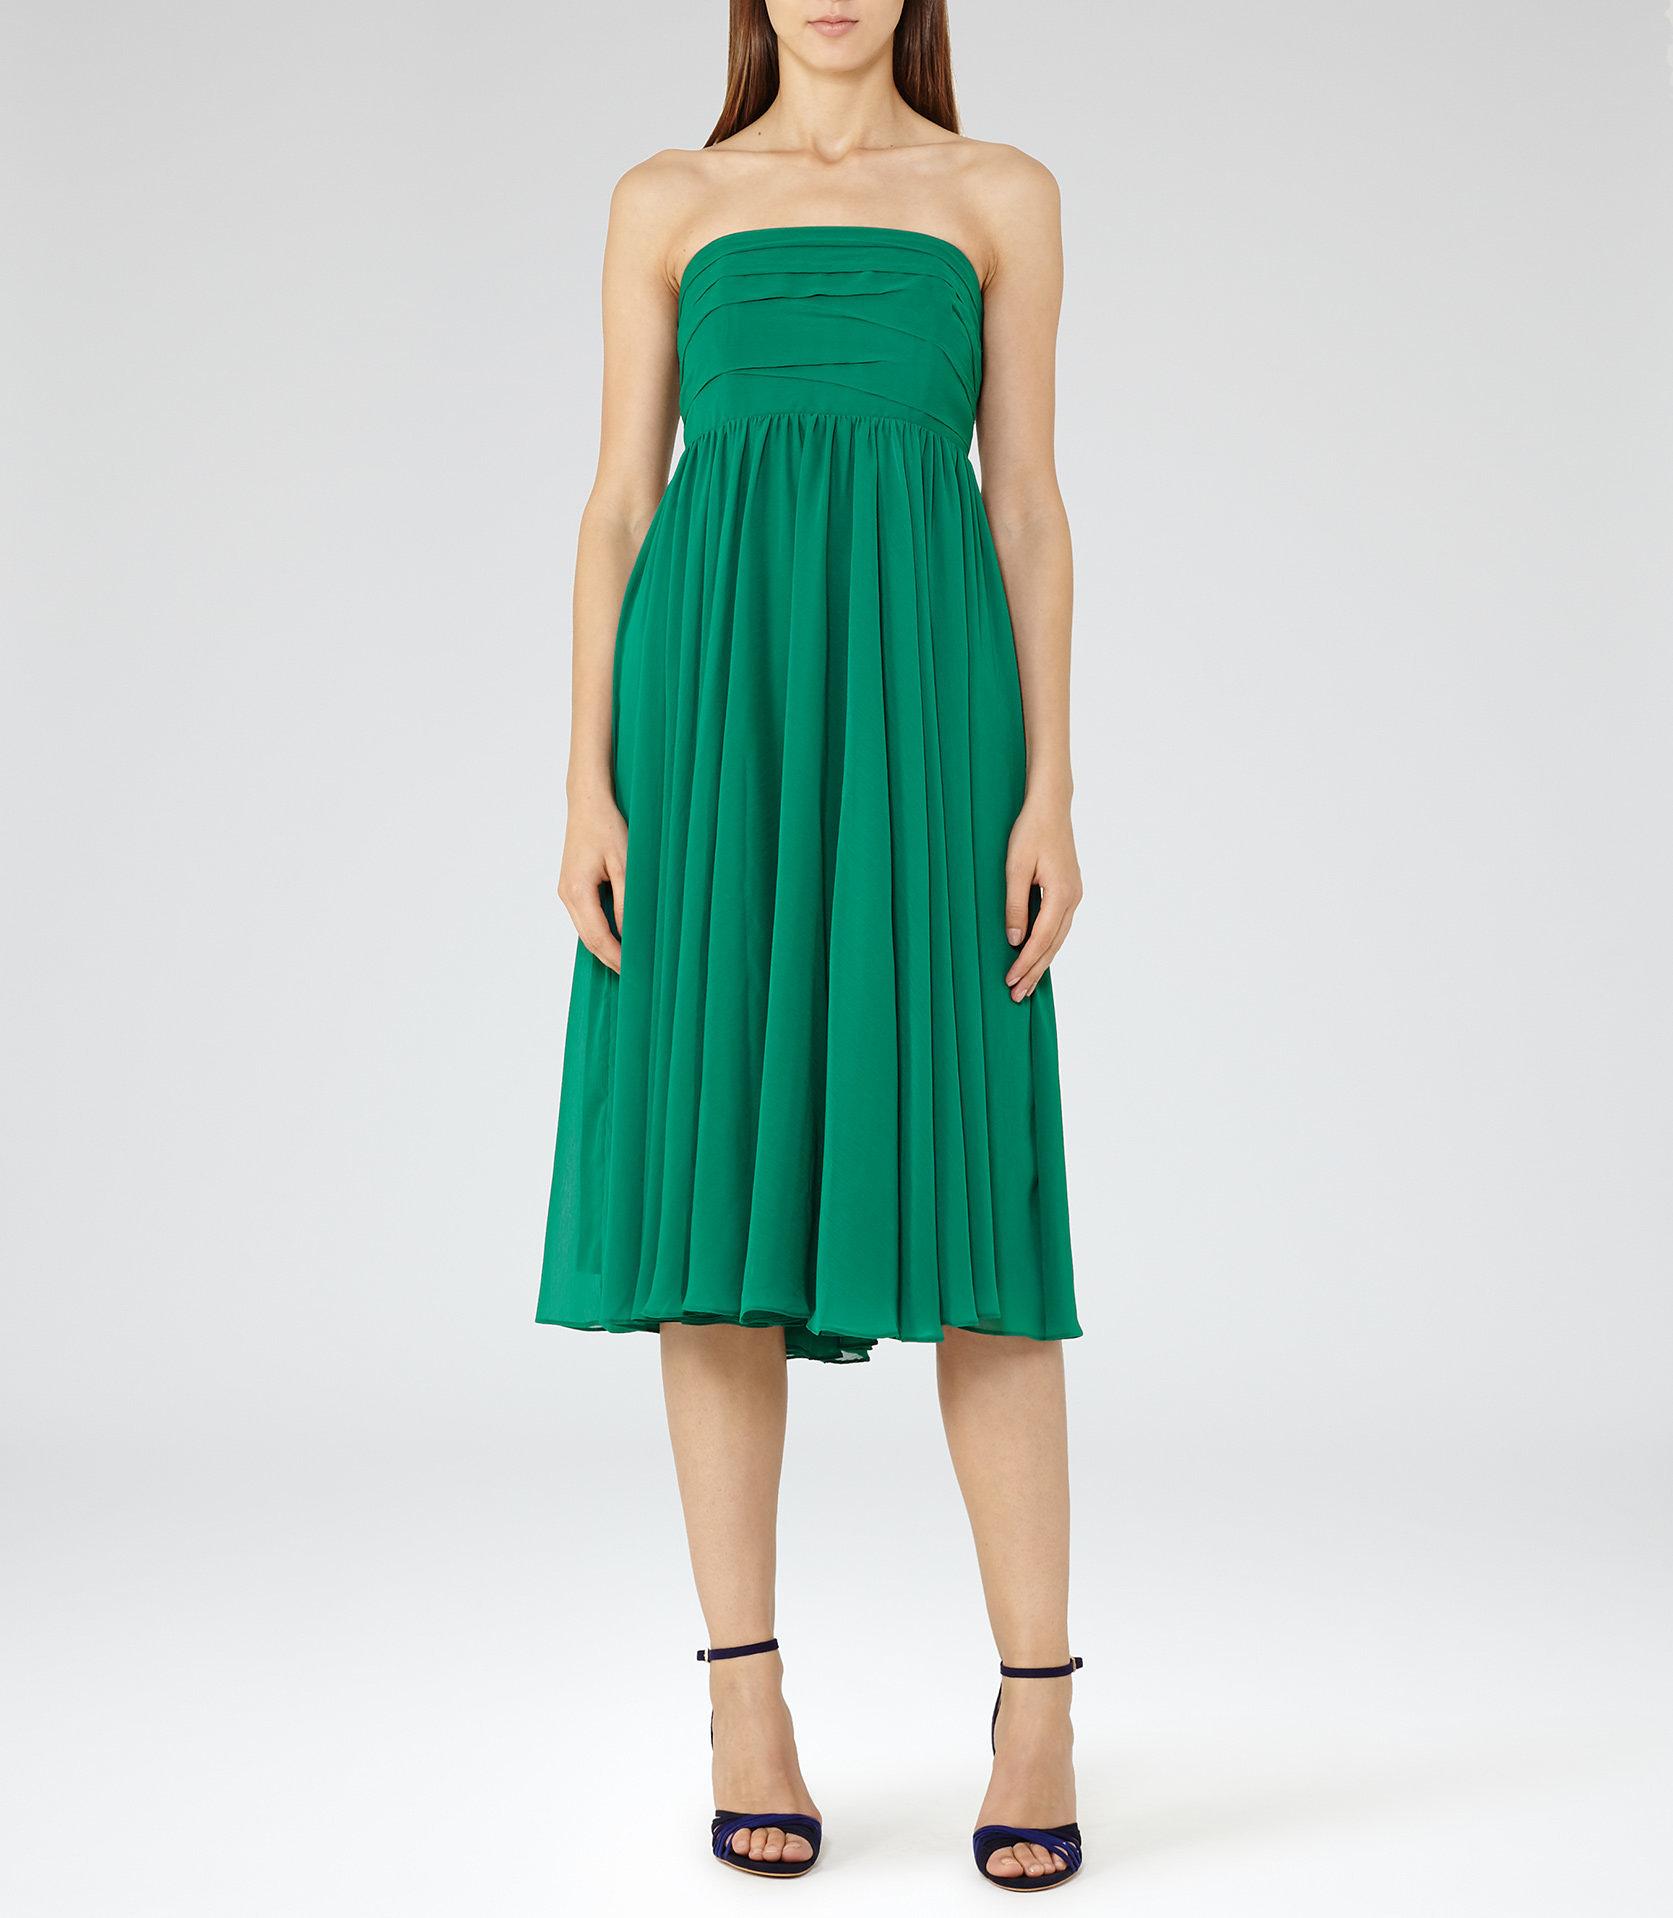 ATHENA STRAPLESS LAYERED DRESS EMERALD GREEN